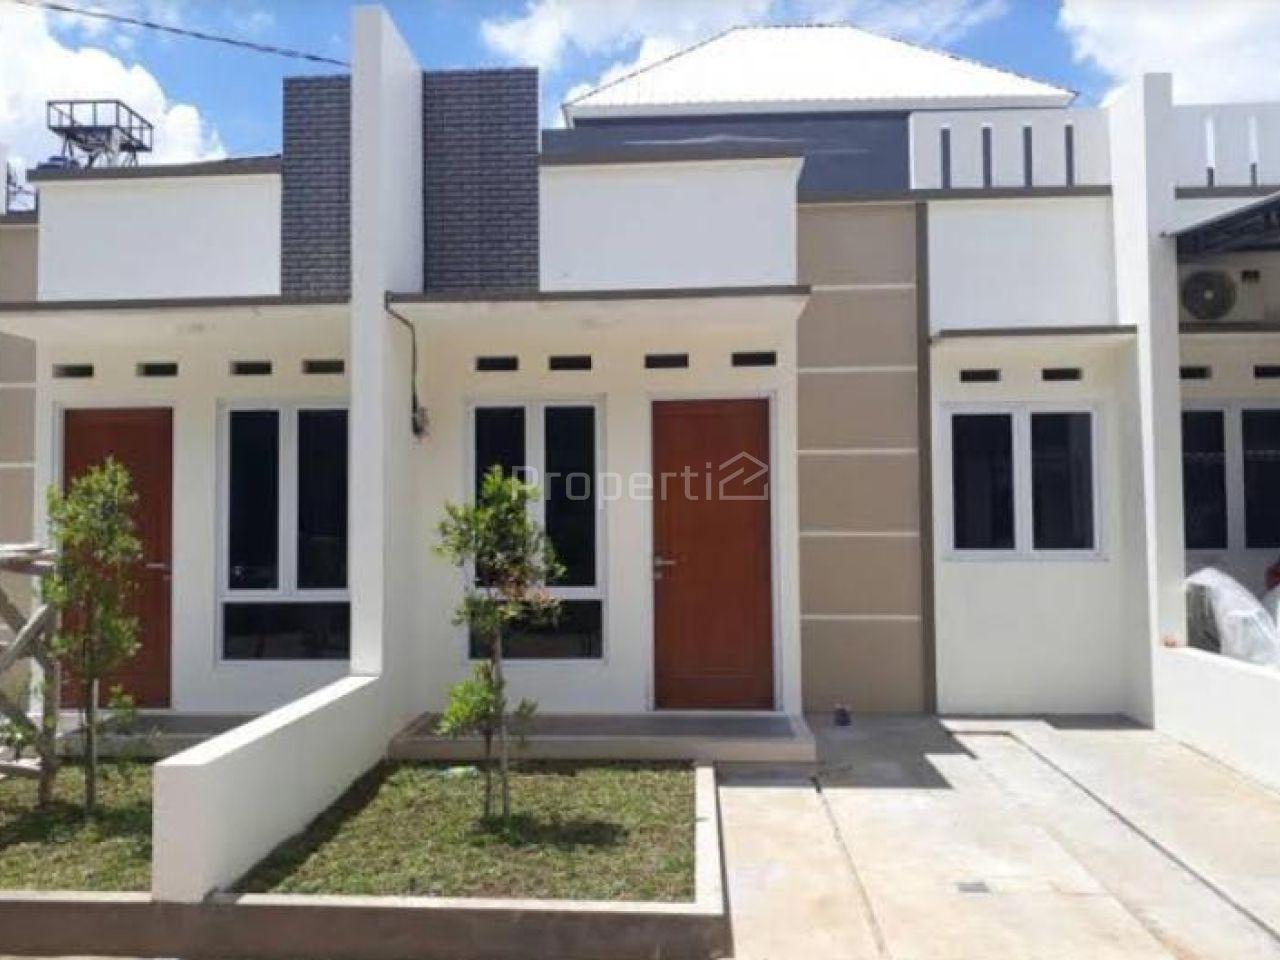 Cheap House in Tlogowaru, Kedungkandang, Malang City, Jawa Timur